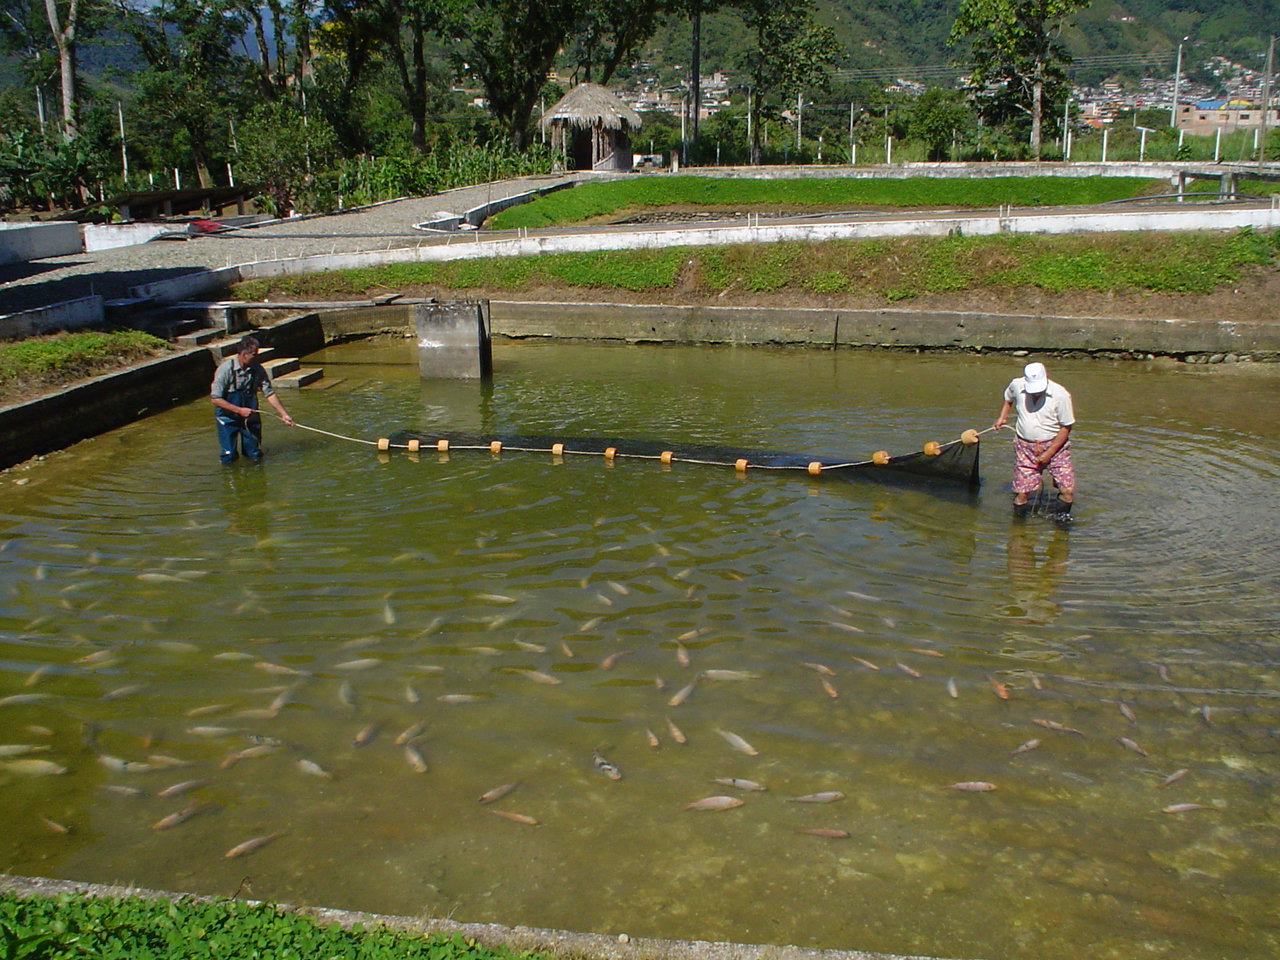 Impulsan la producci n sostenible de truchas en bolivia for Cria de mojarra en estanques